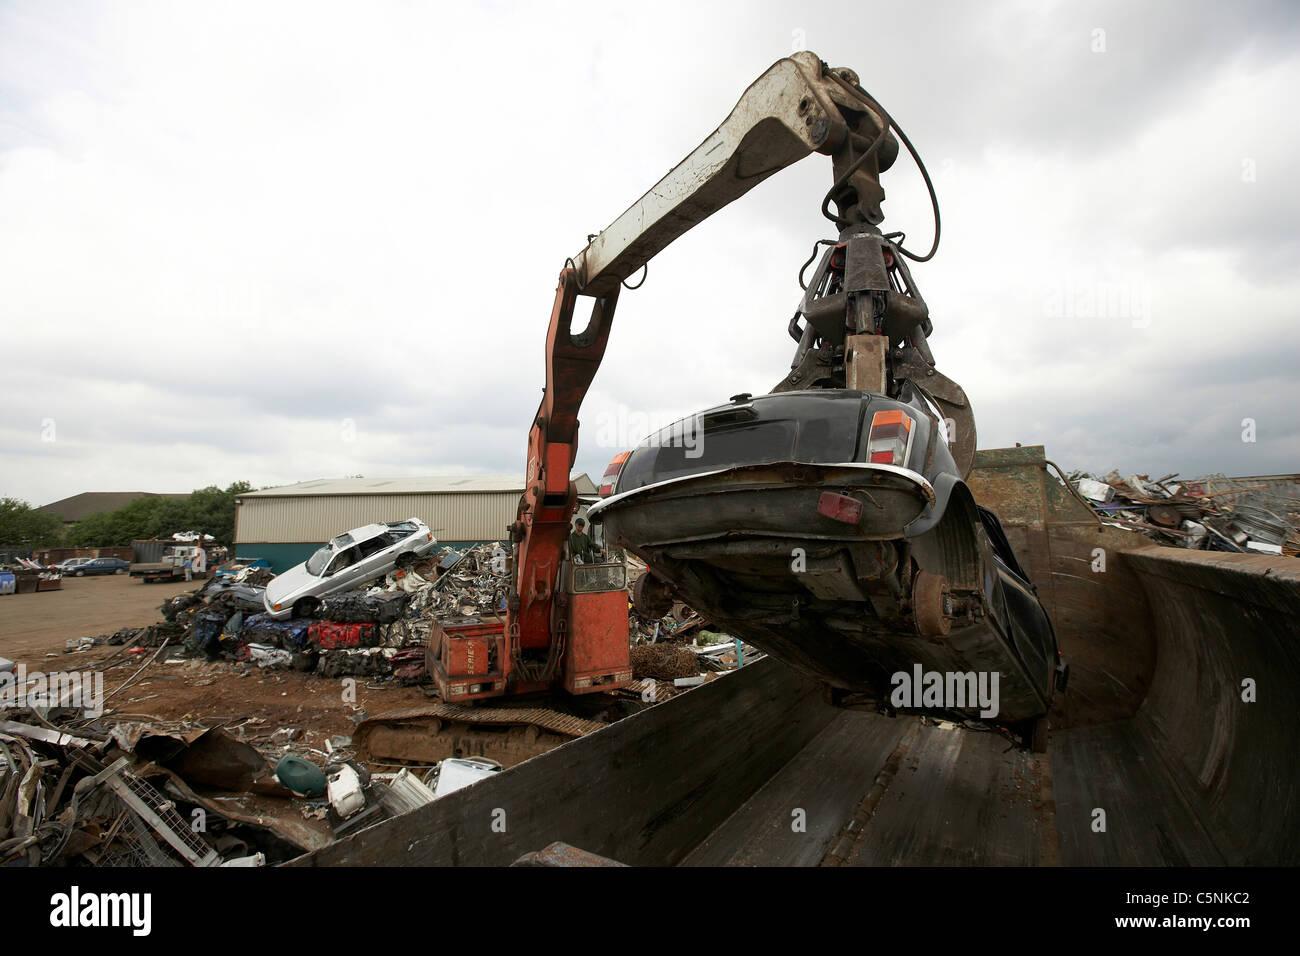 Crane lifting scrap car into a car crusher for recycling in a scrapyard, uk - Stock Image